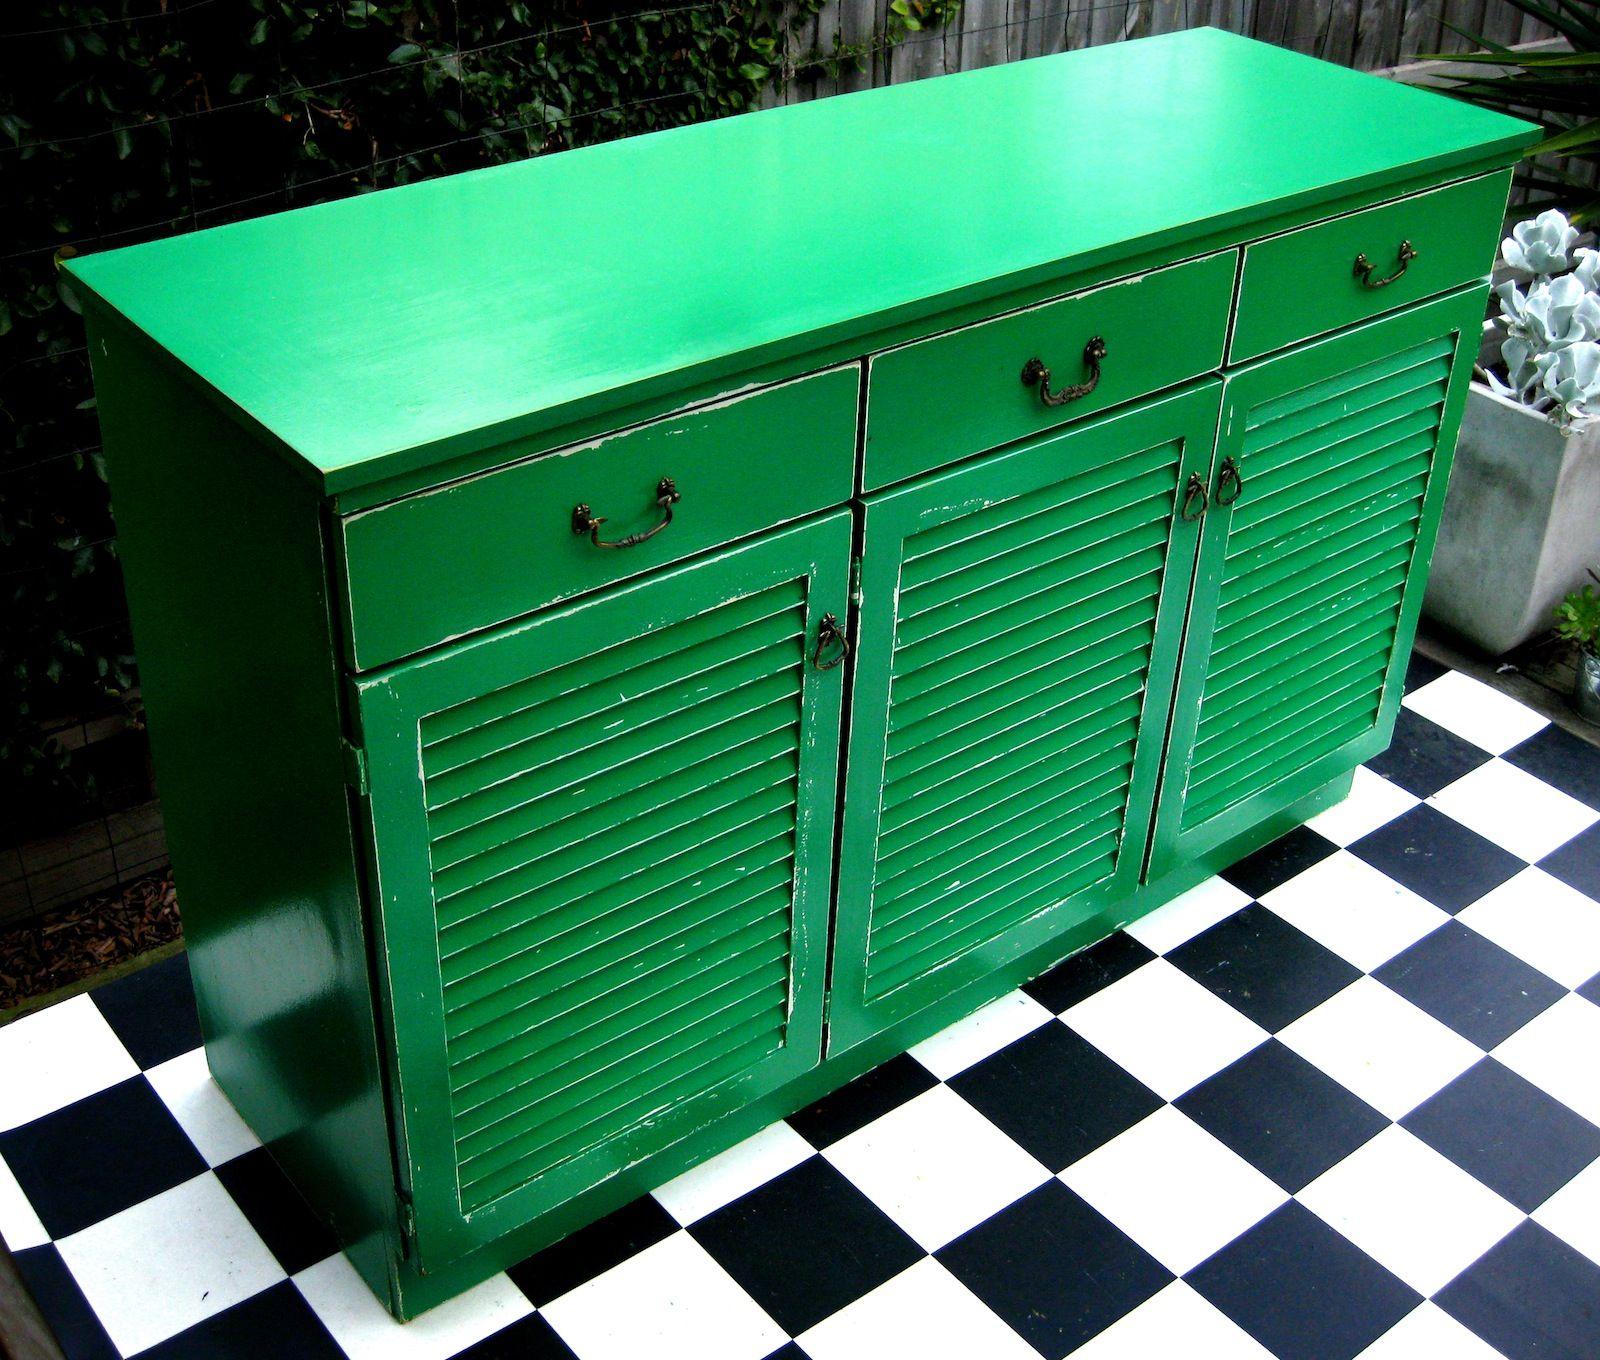 Restored Buffet with louvre cupboard doors in emerald